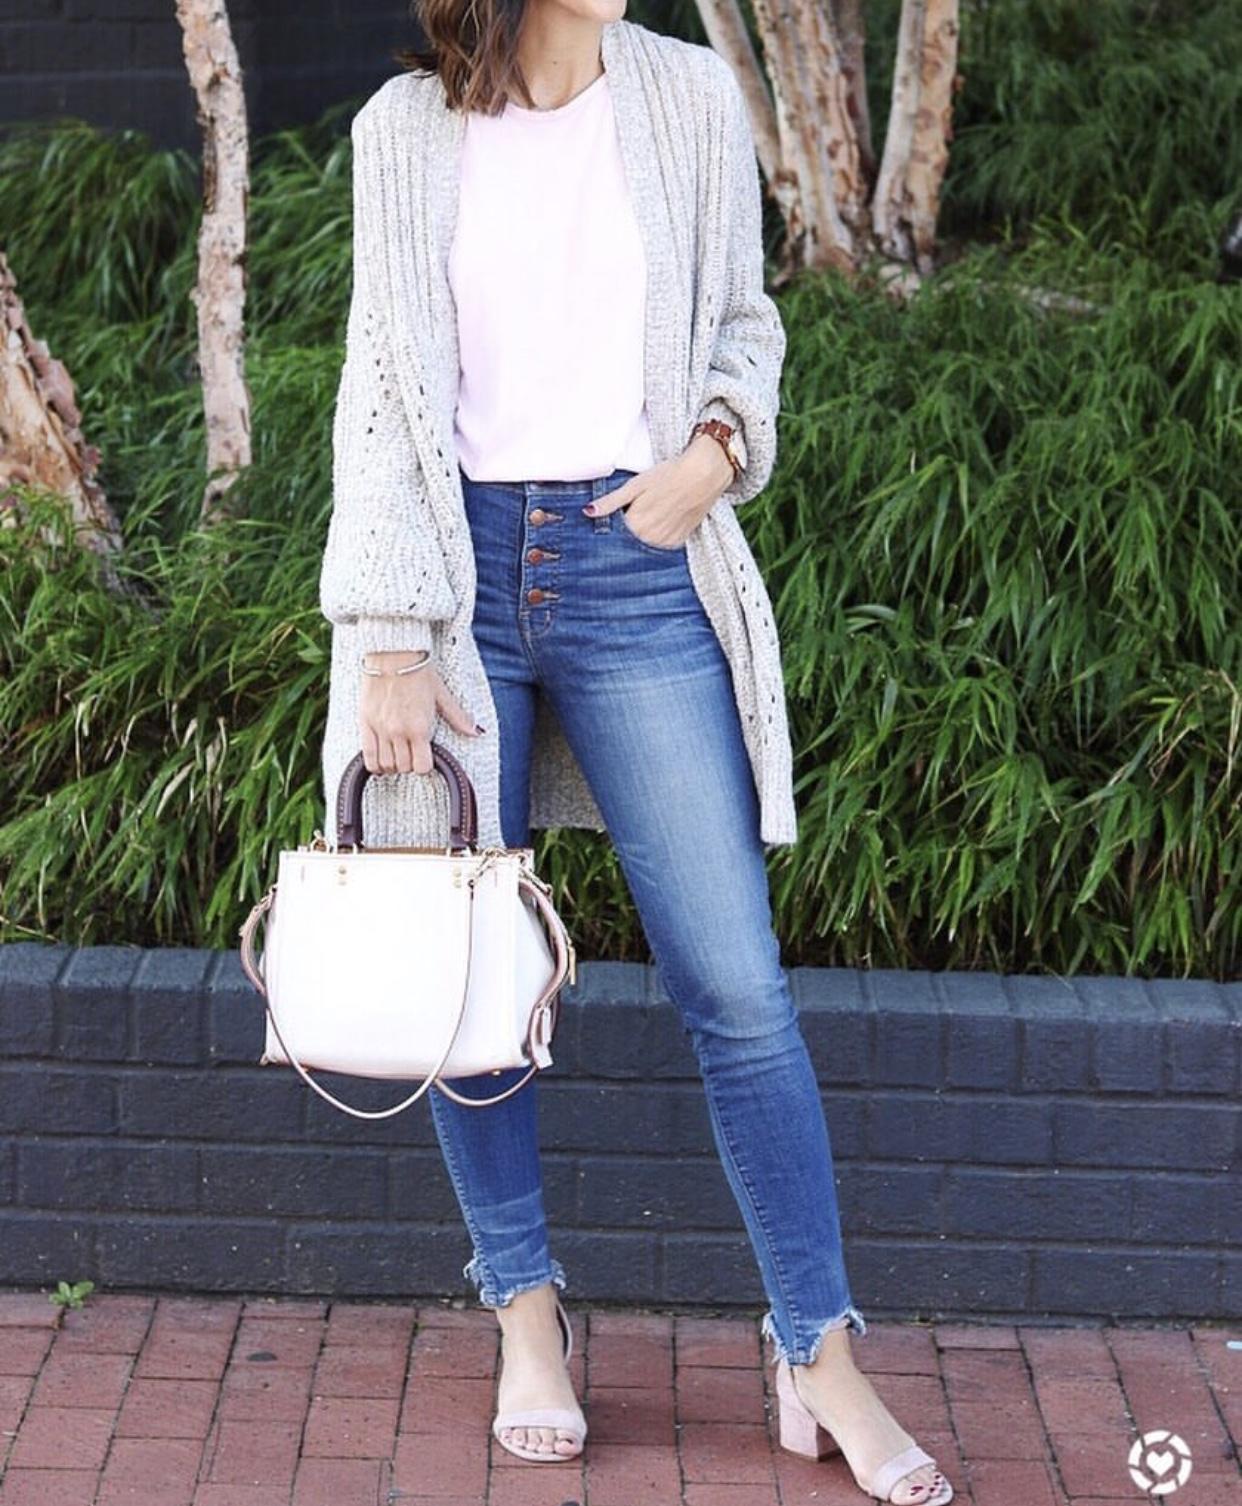 Cozy Grey Cardigan  - Instagram Fashion Lately by Washington DC fashion blogger Cobalt Chronicles